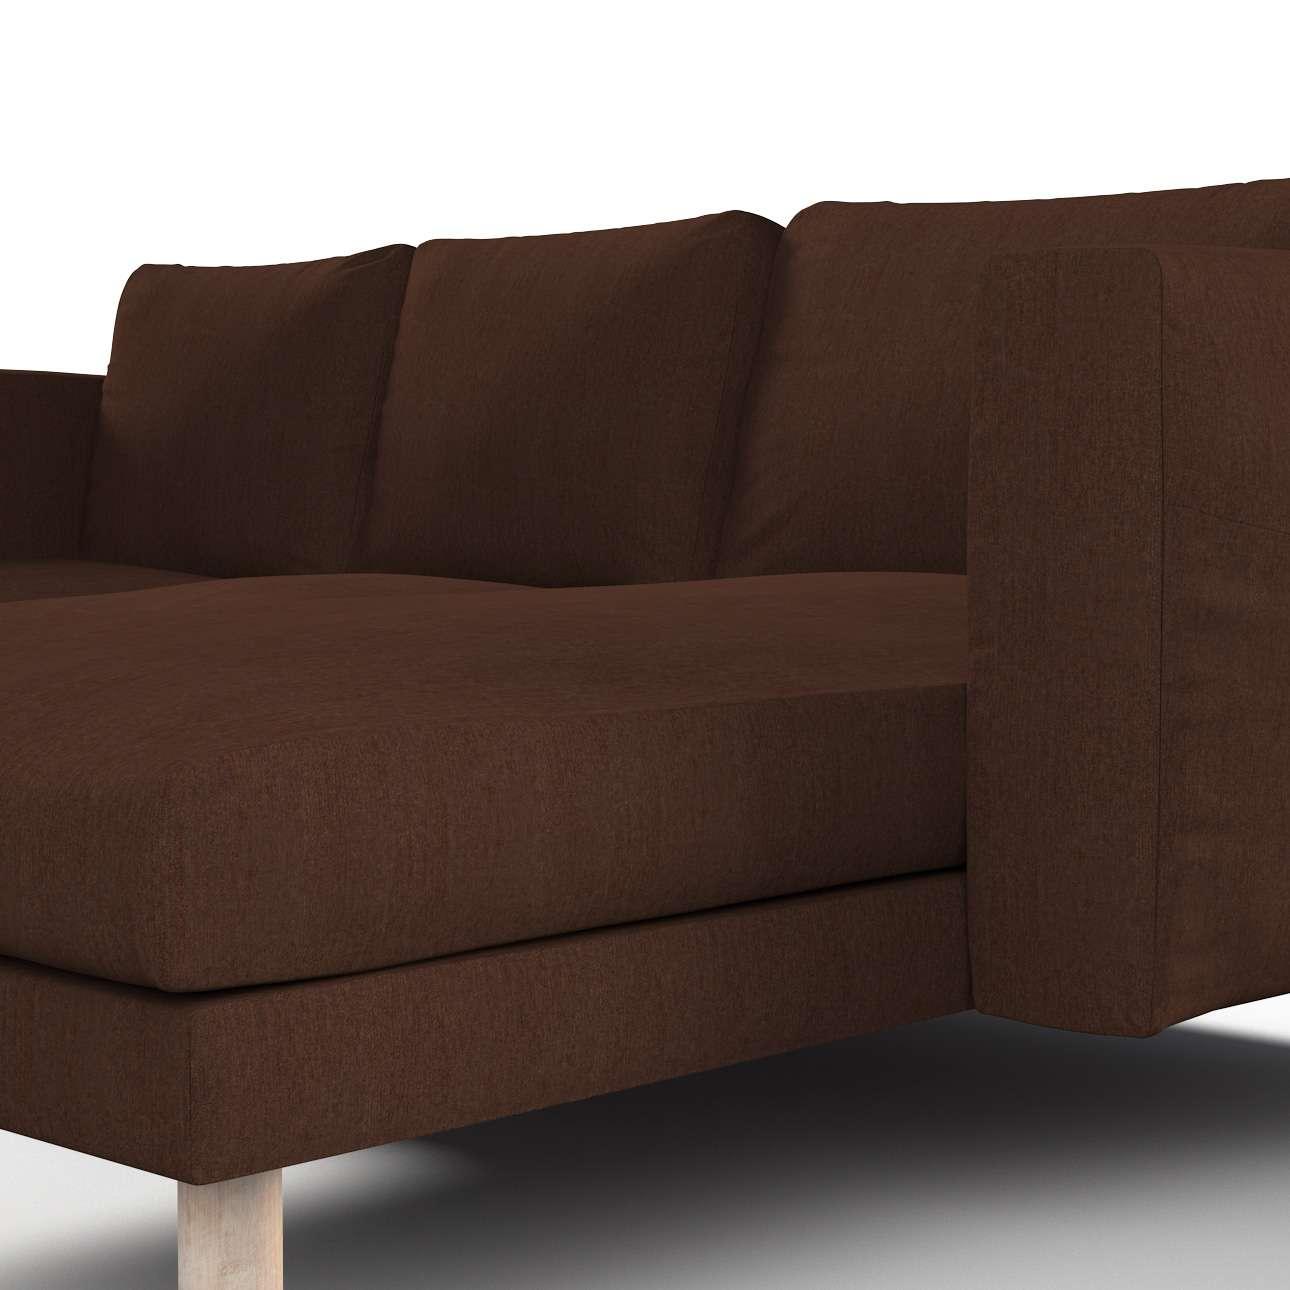 norsborg bezug f r 3 sitzer sofa mit recamiere mocca. Black Bedroom Furniture Sets. Home Design Ideas